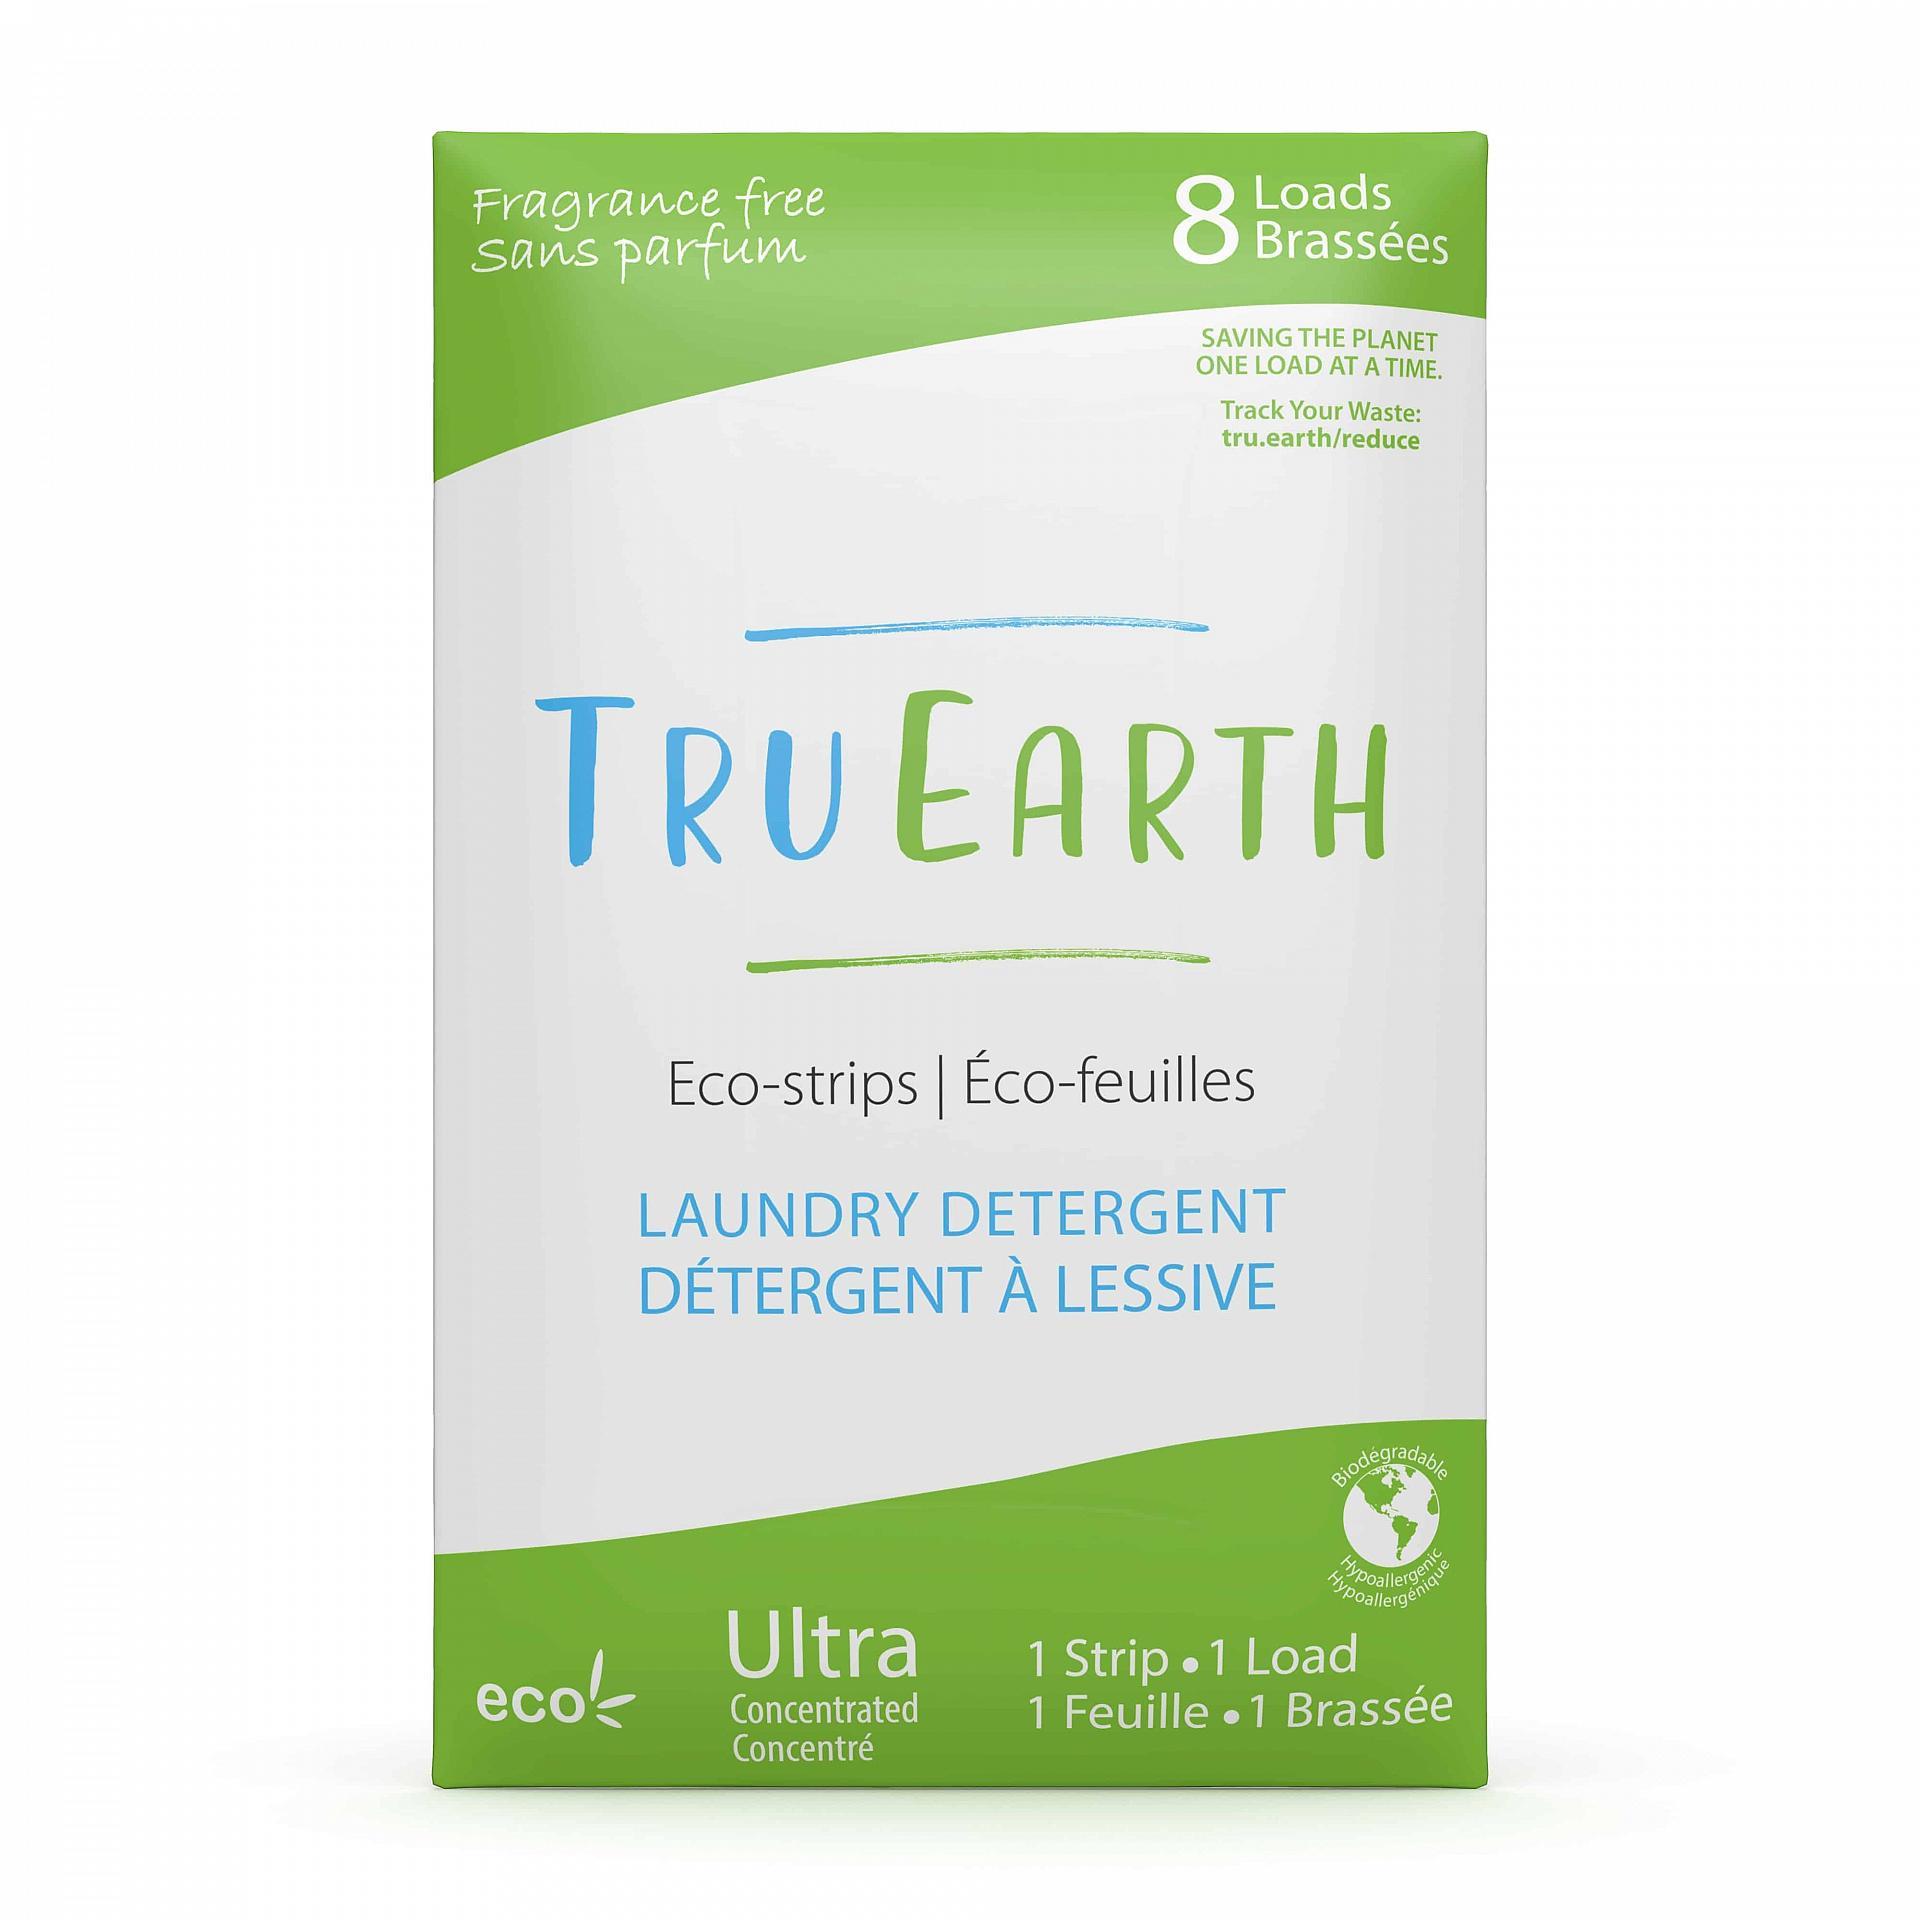 Tru_Earth_Eco_strips_Laundry_Detergent_fragrance_free_8_Loads